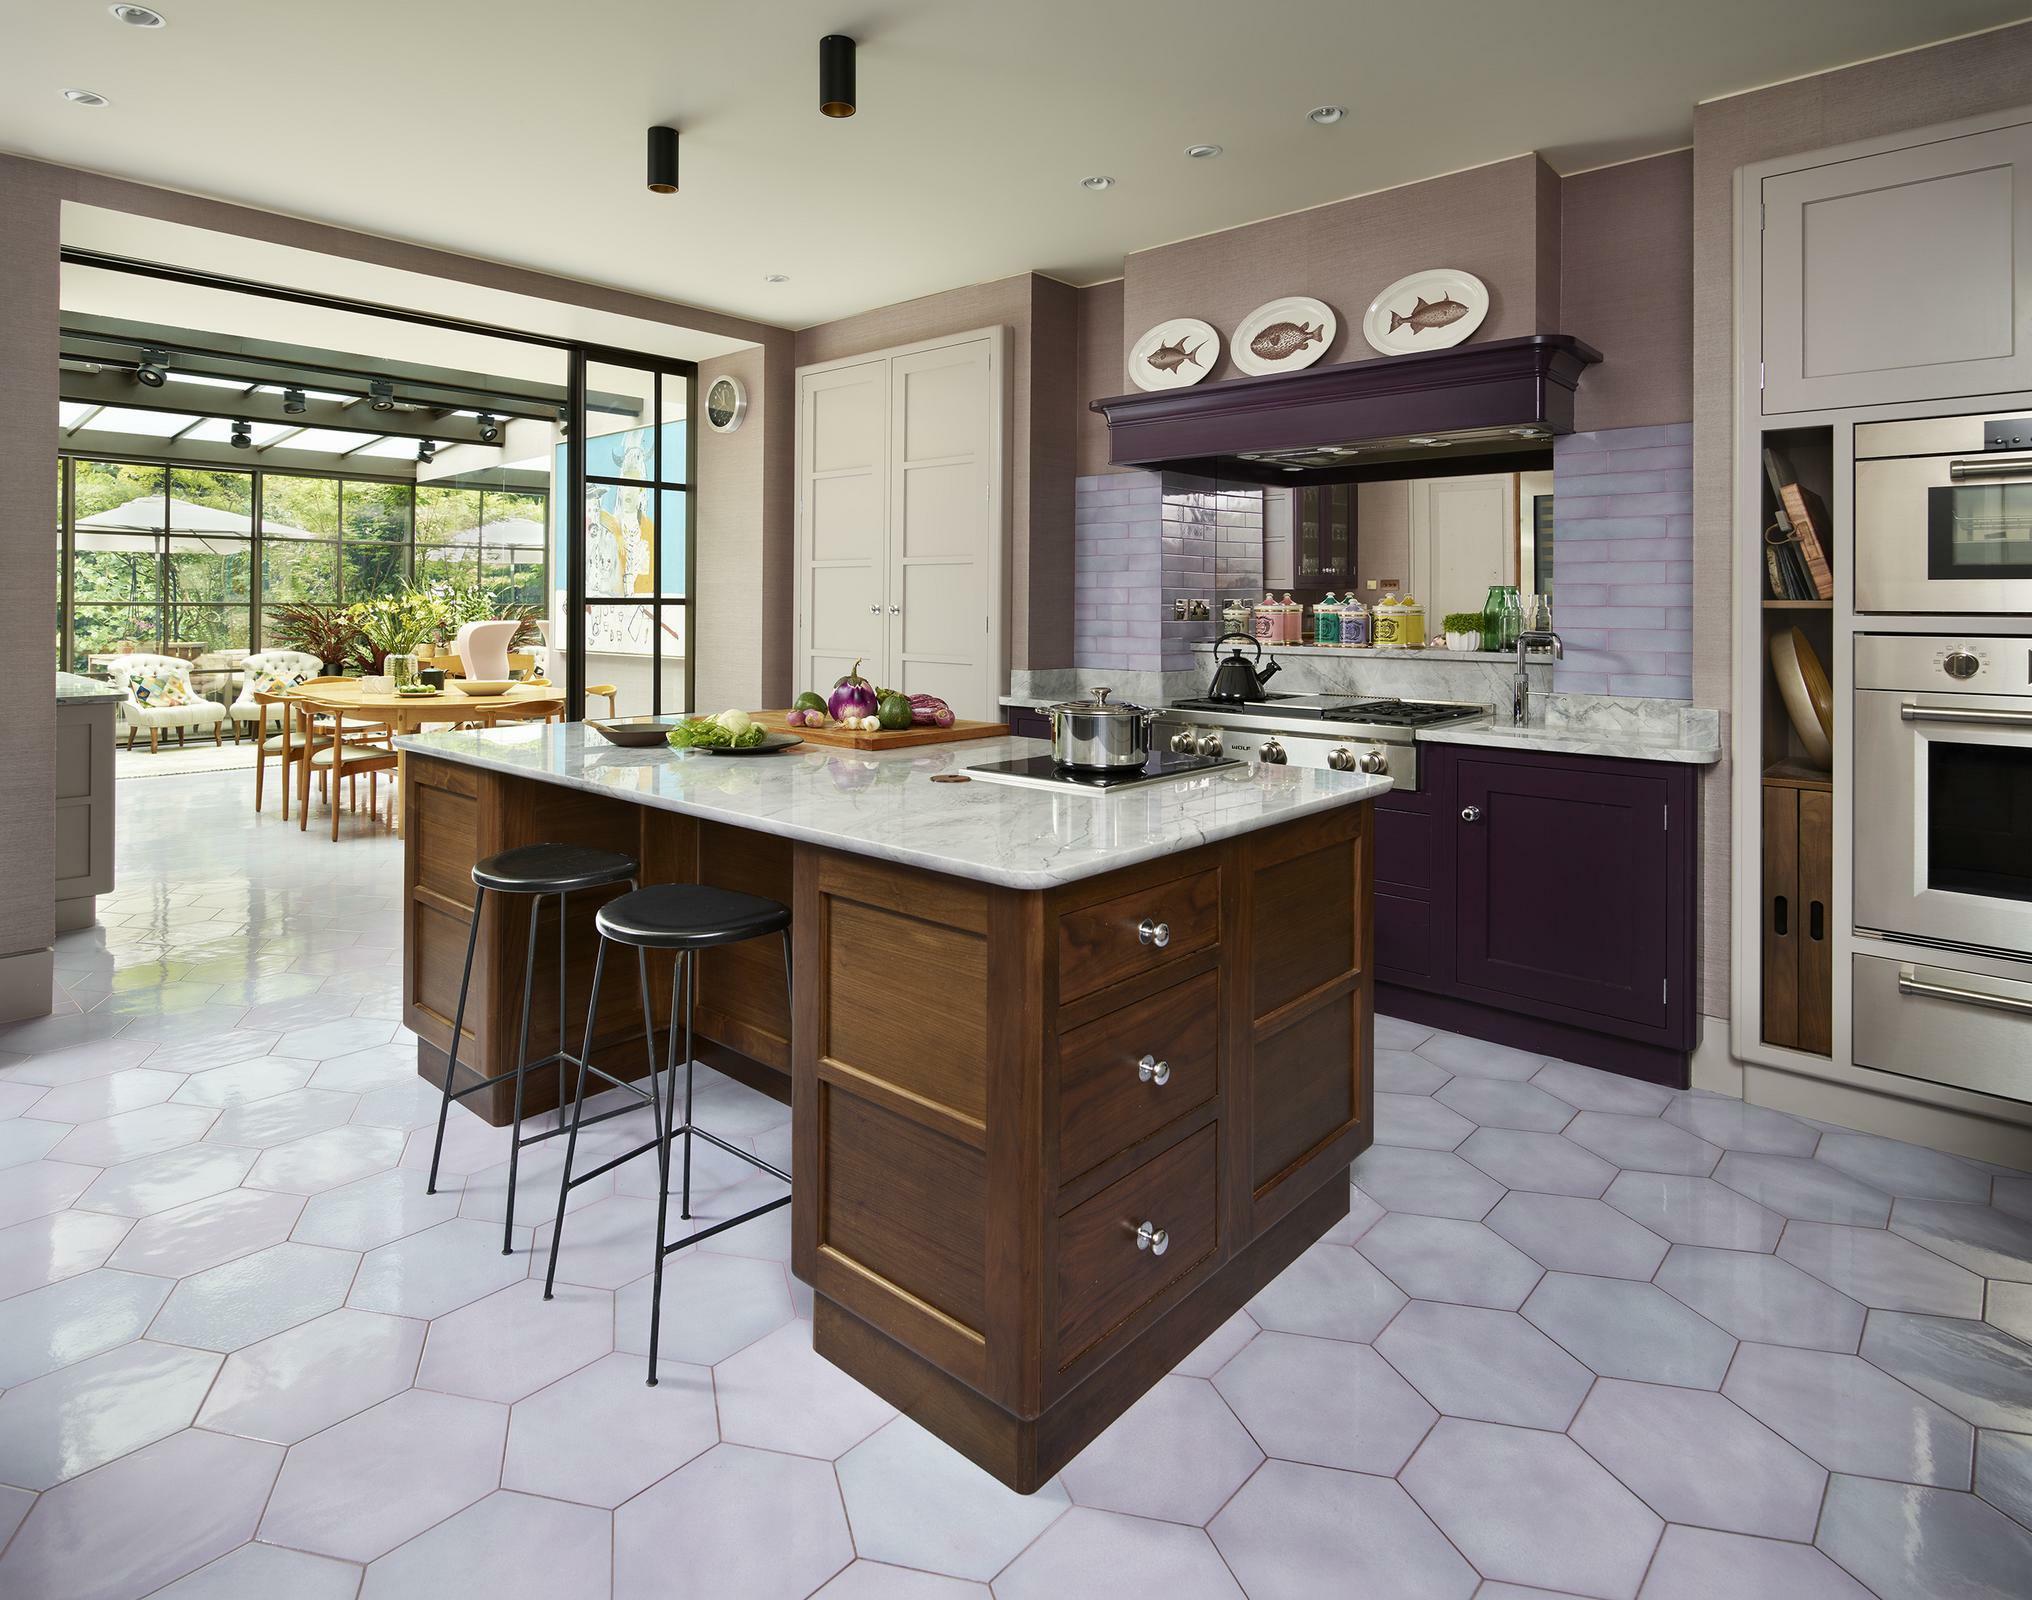 Kitchen Featuring Sealed Burner Rangetop